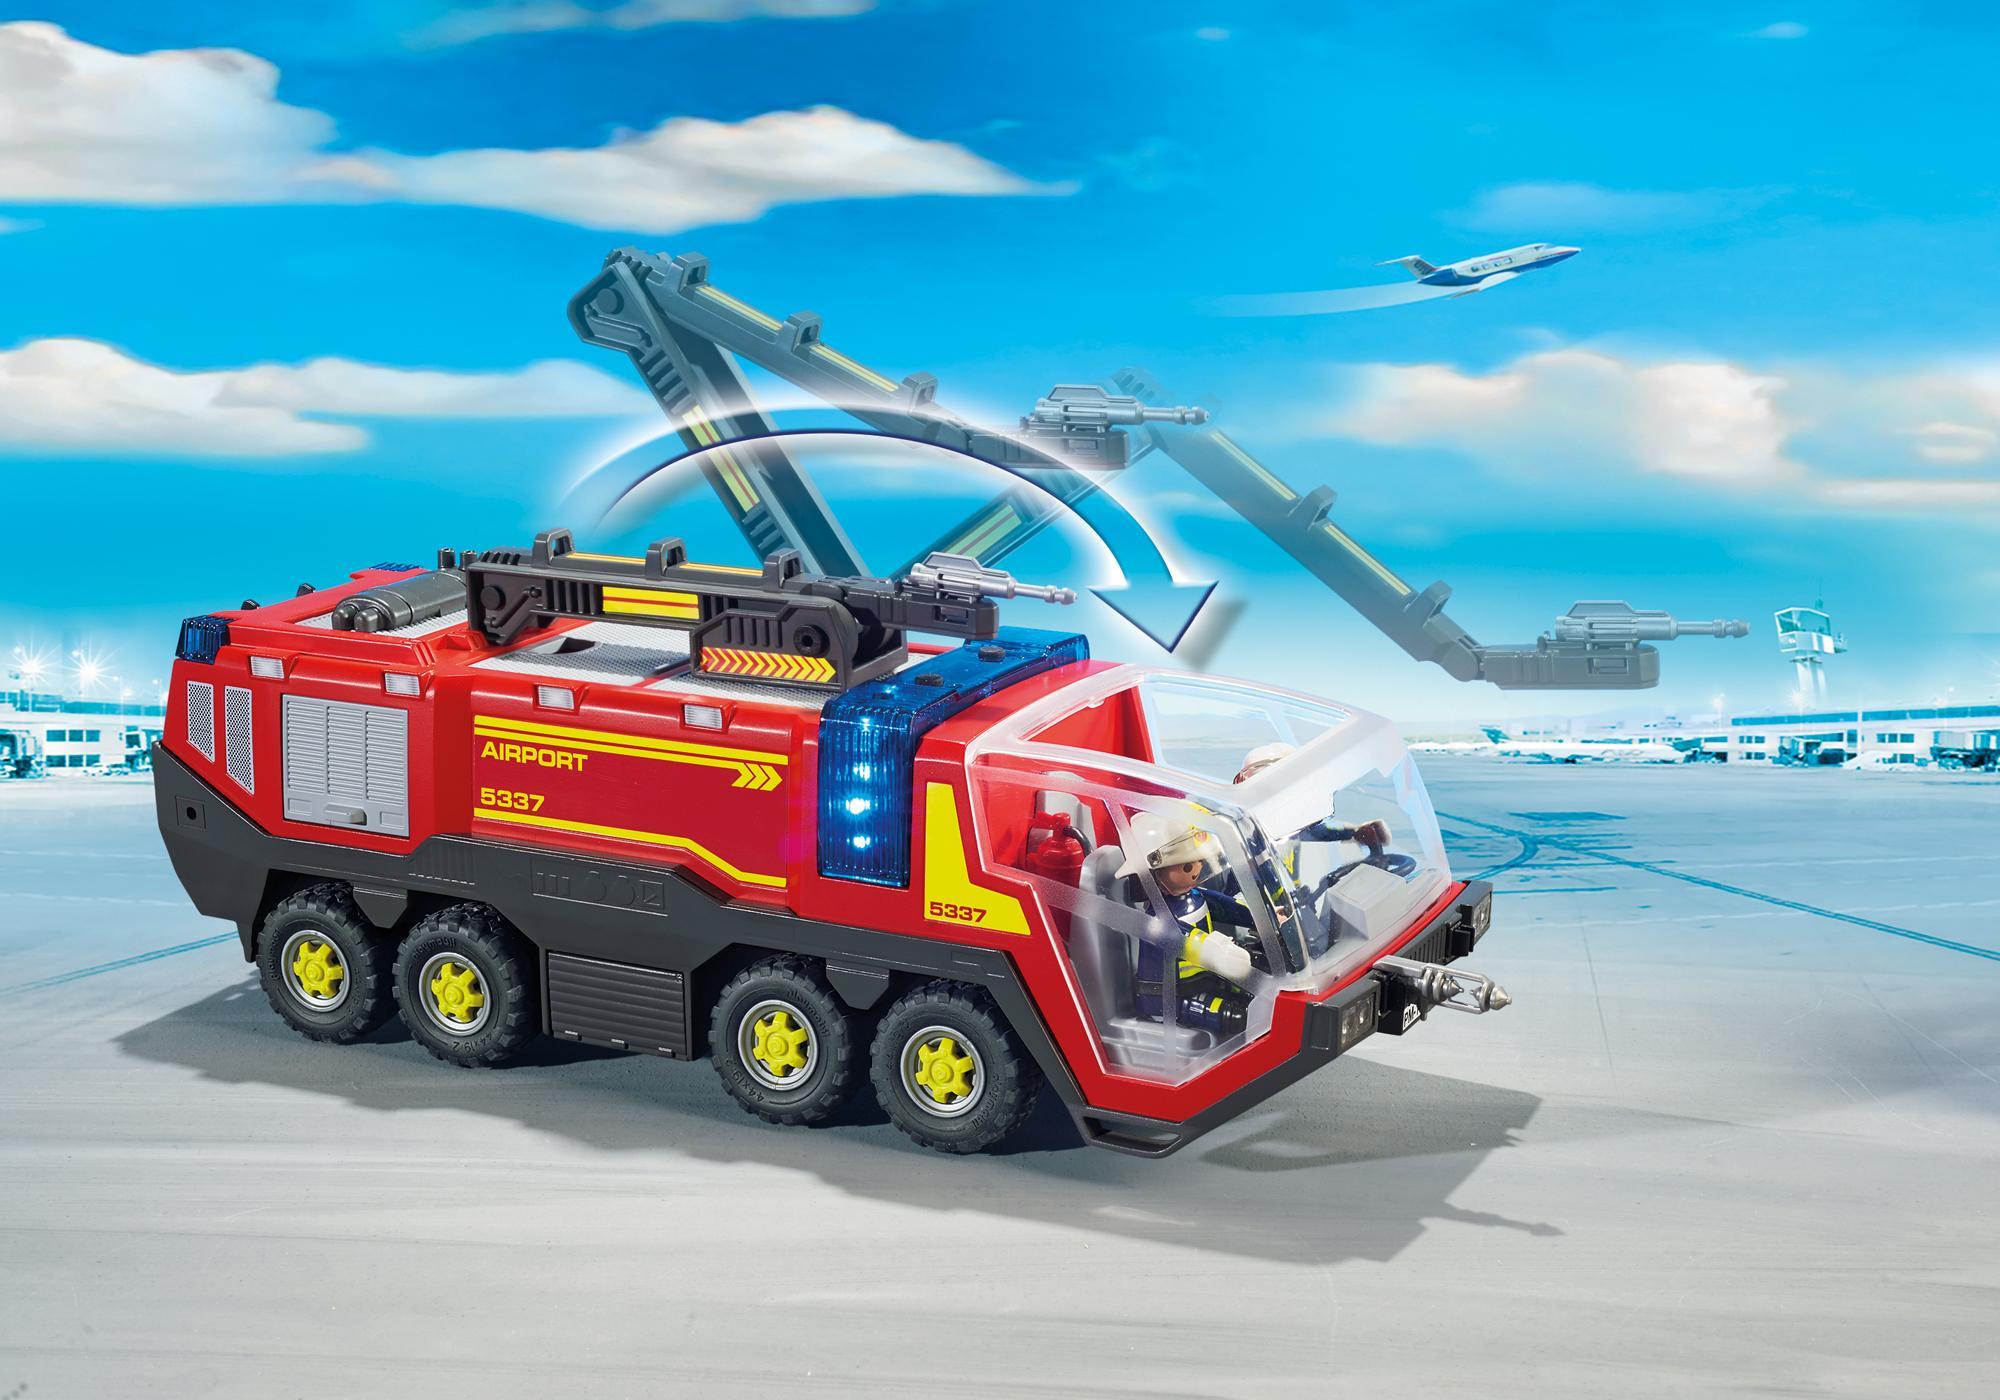 http://media.playmobil.com/i/playmobil/5337_product_extra4